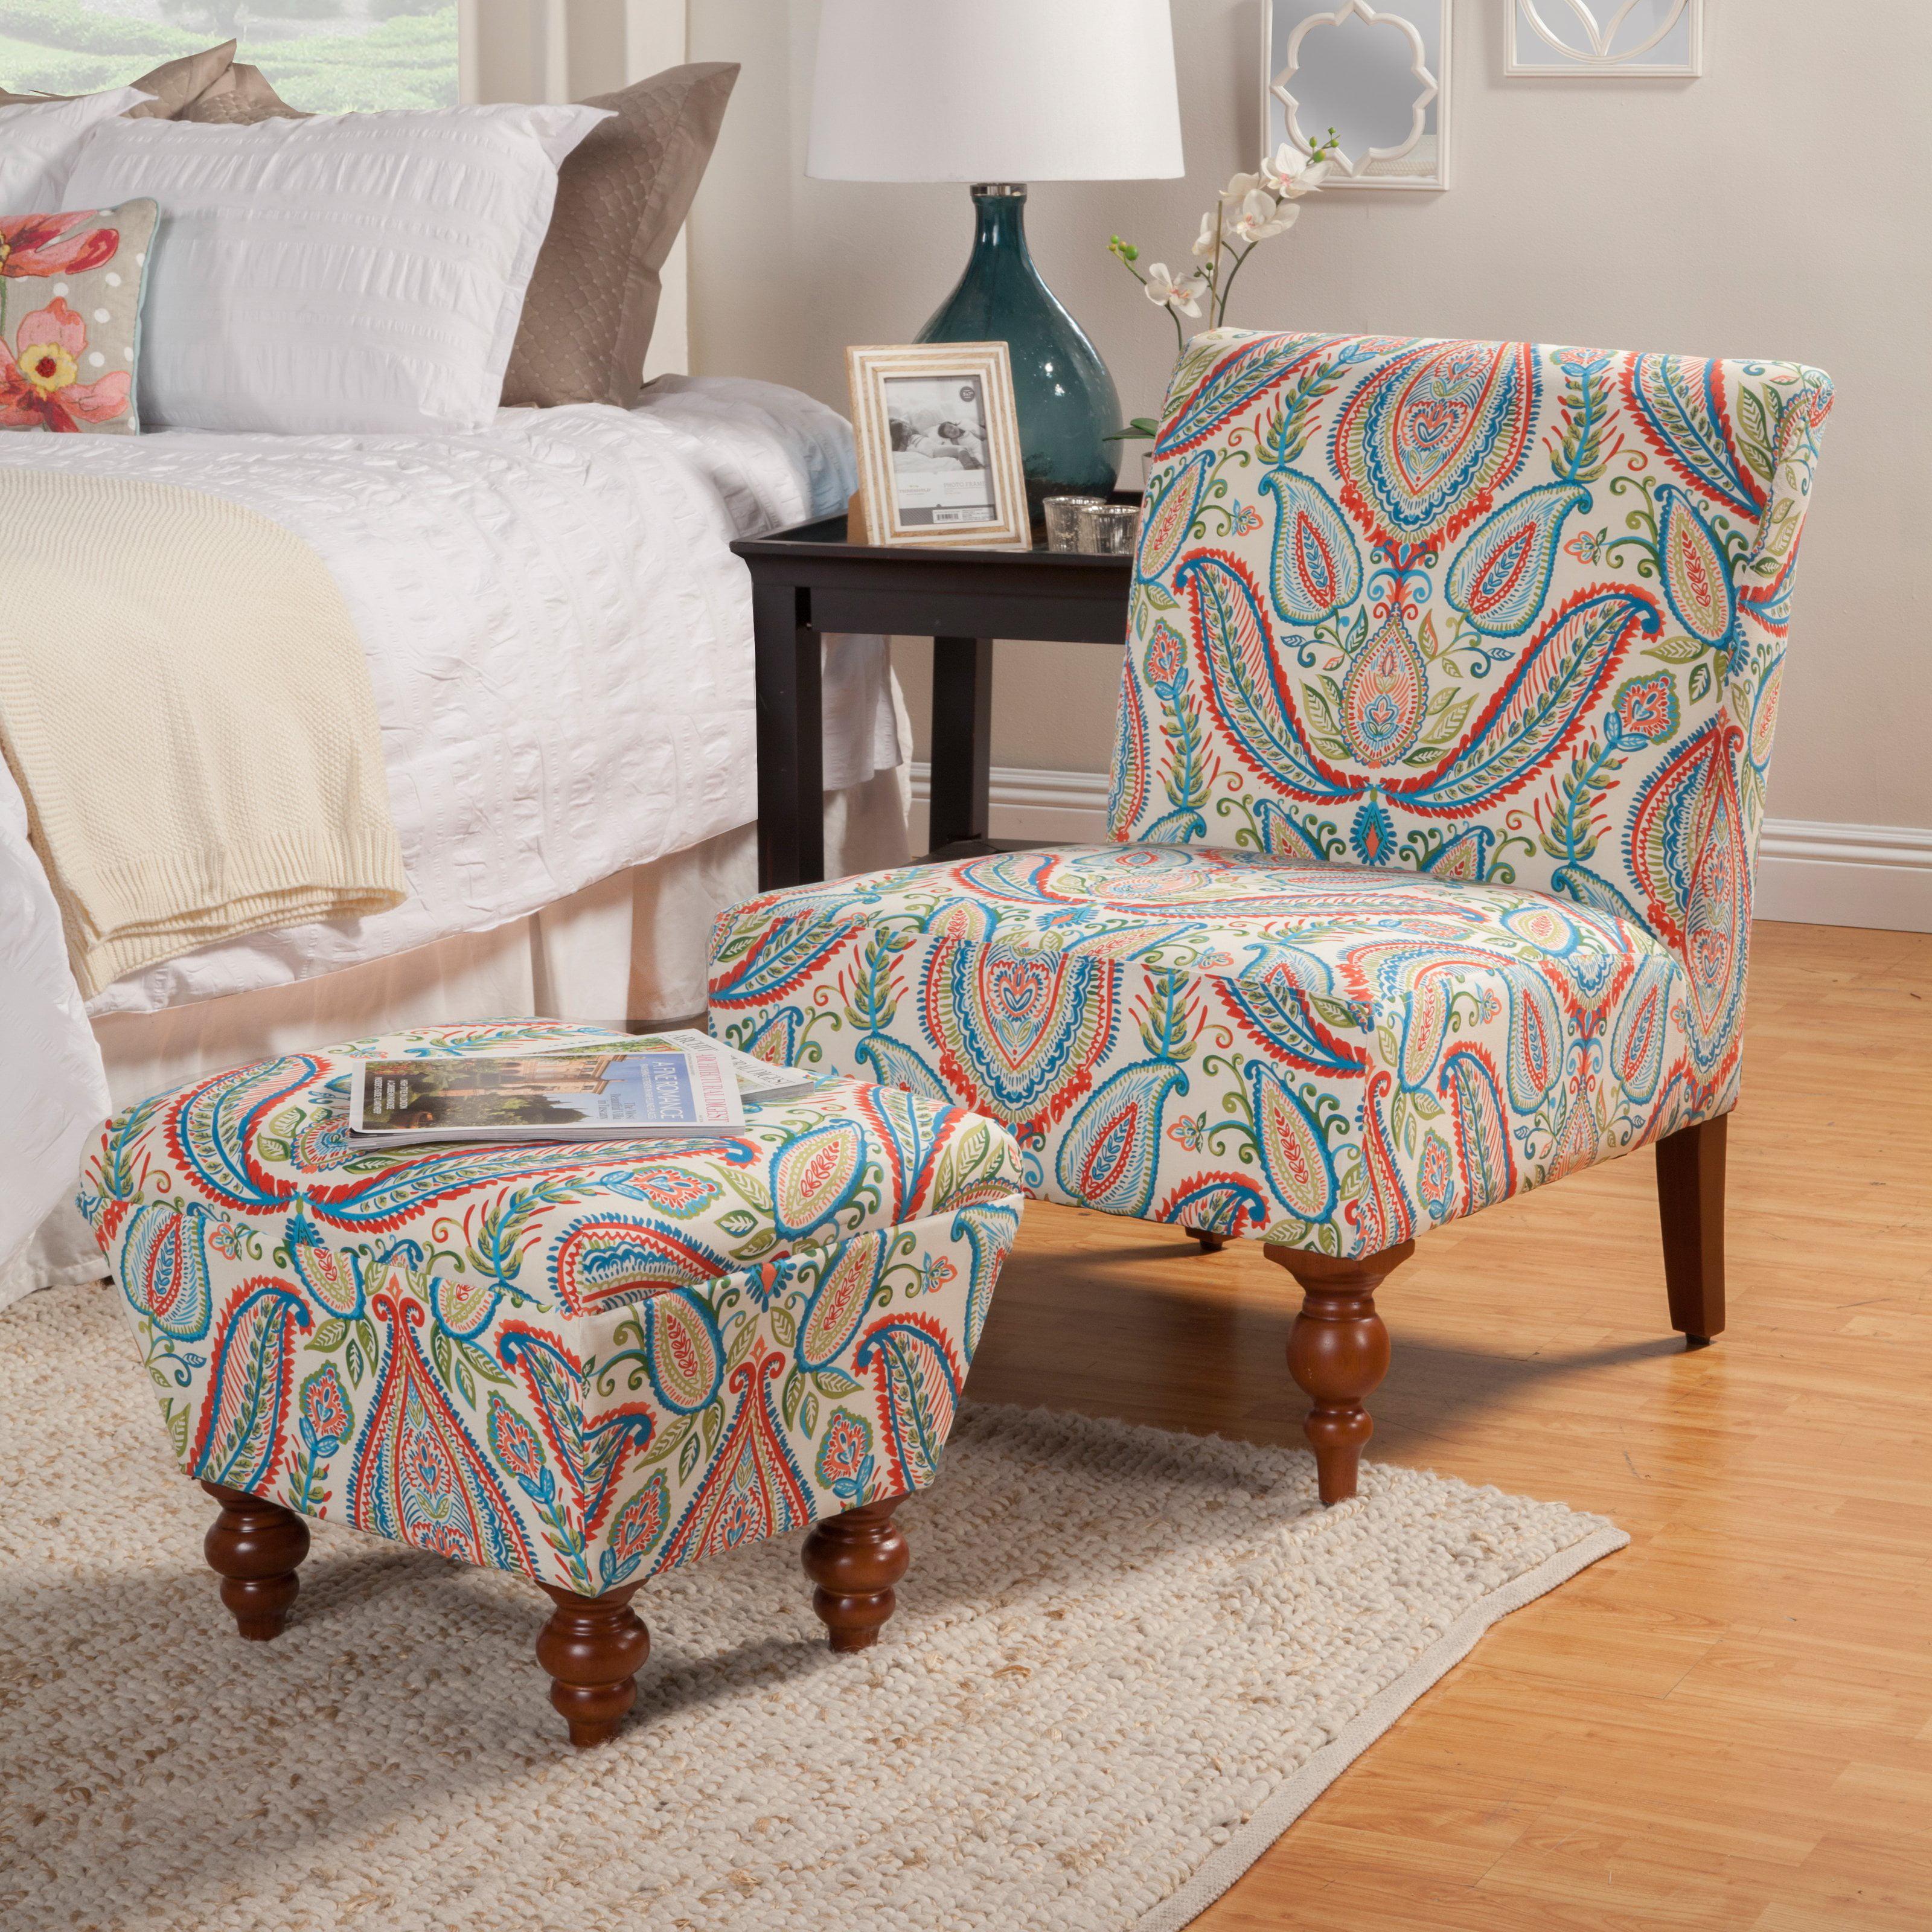 HomePop Susan Armless Accent Chair  Ottoman Set by HomePop